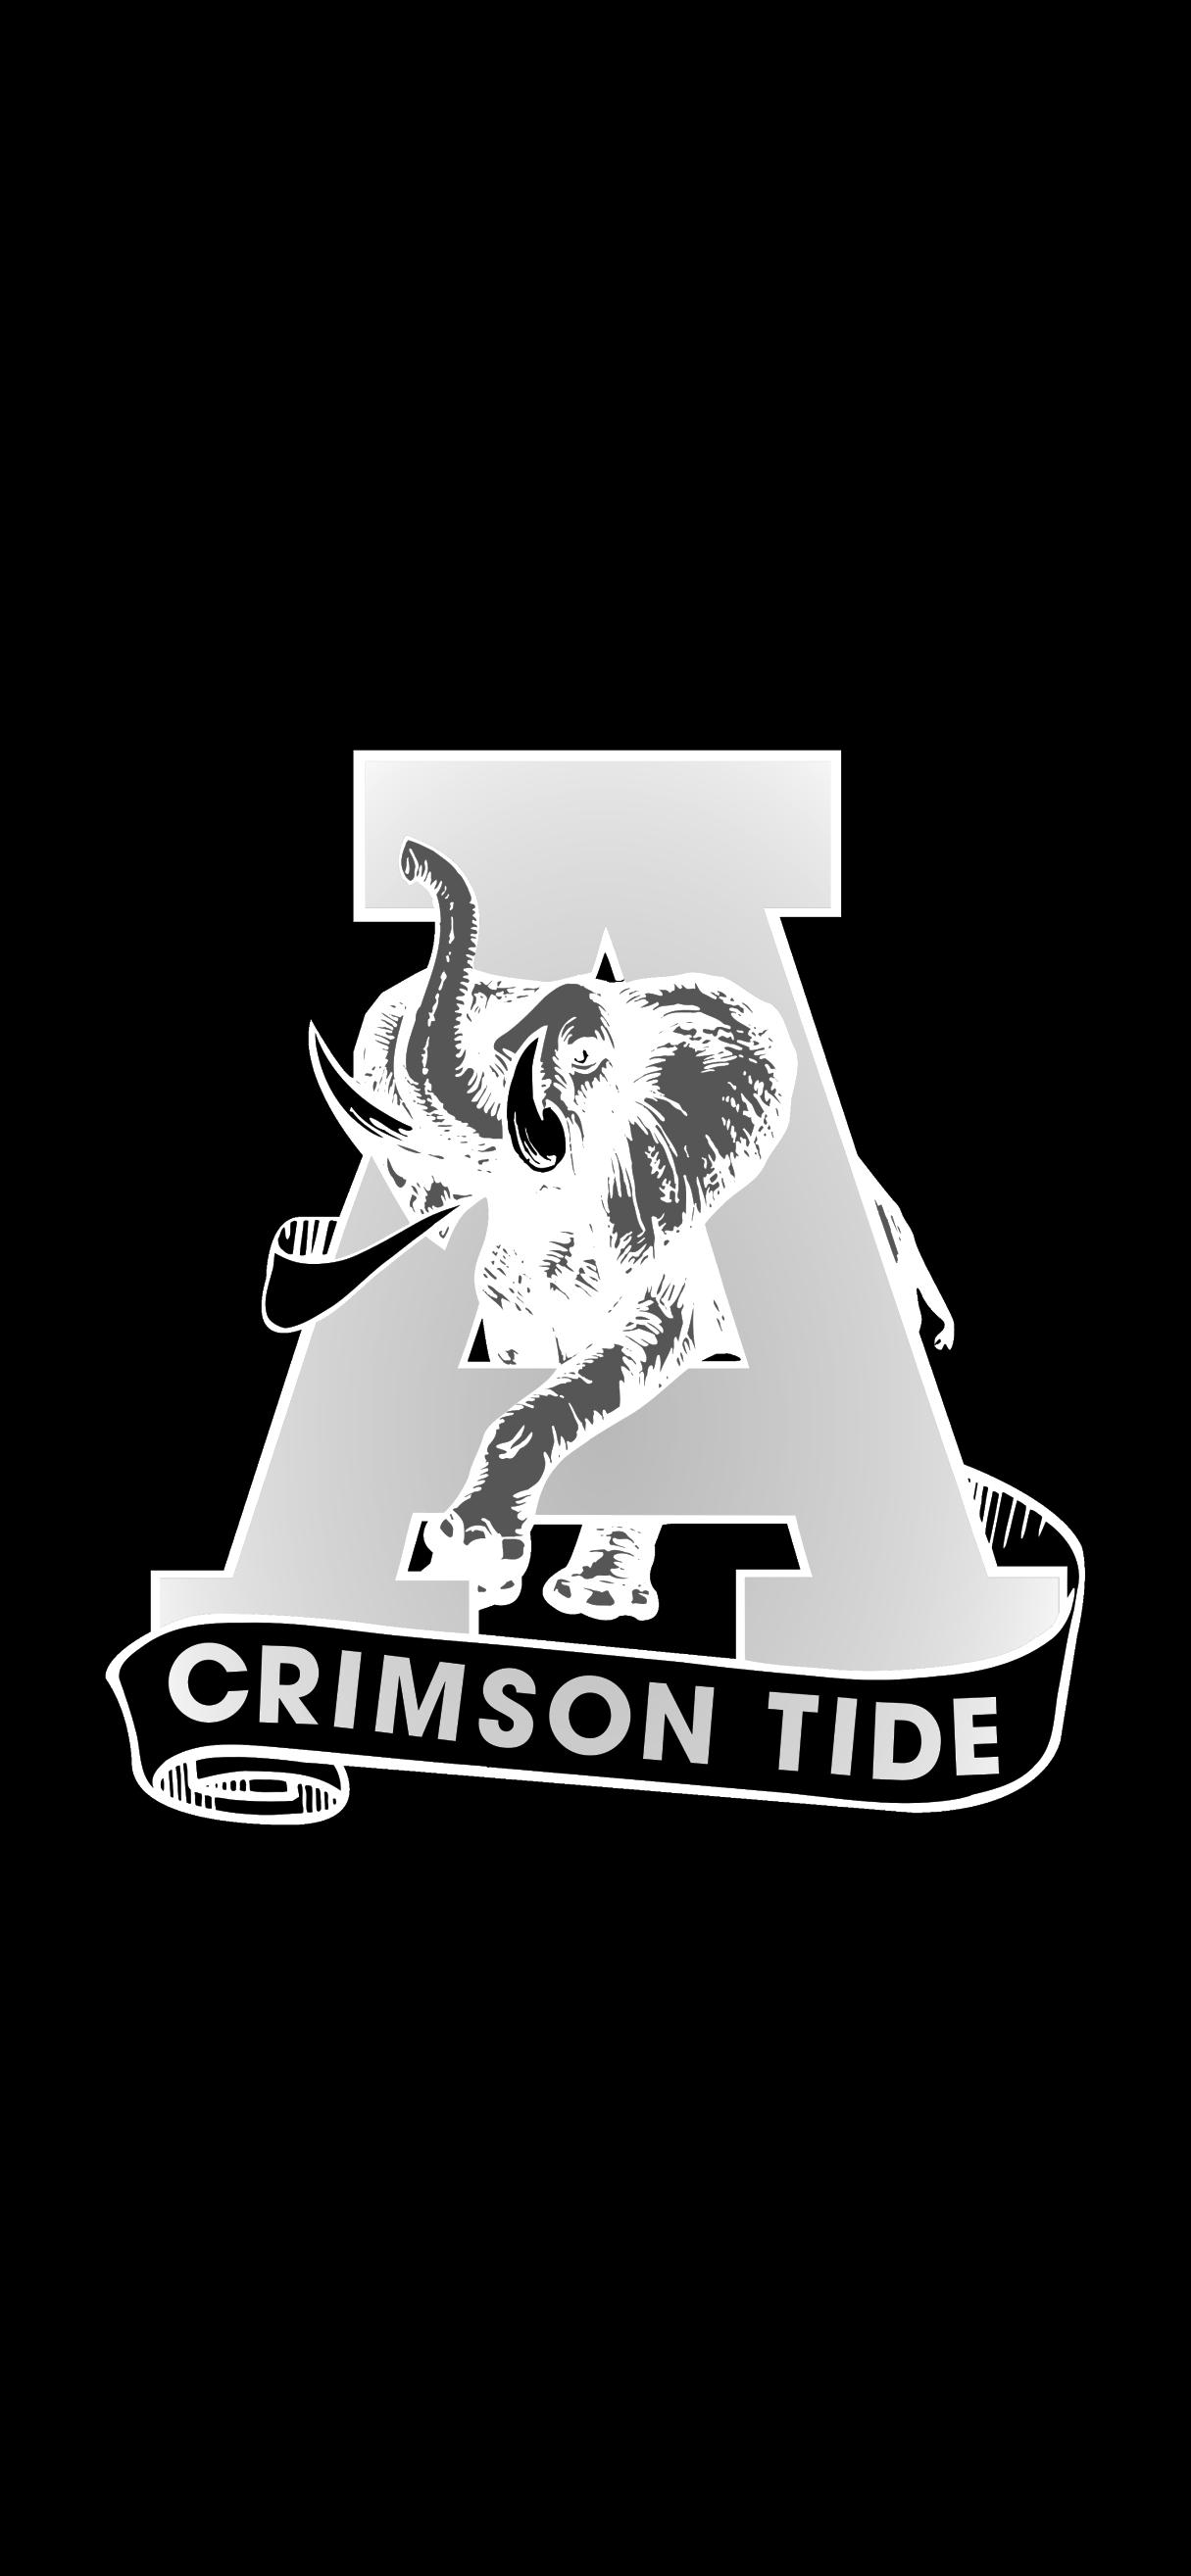 Alabama Crimson Tide Football Wallpaper Iphone Android 26